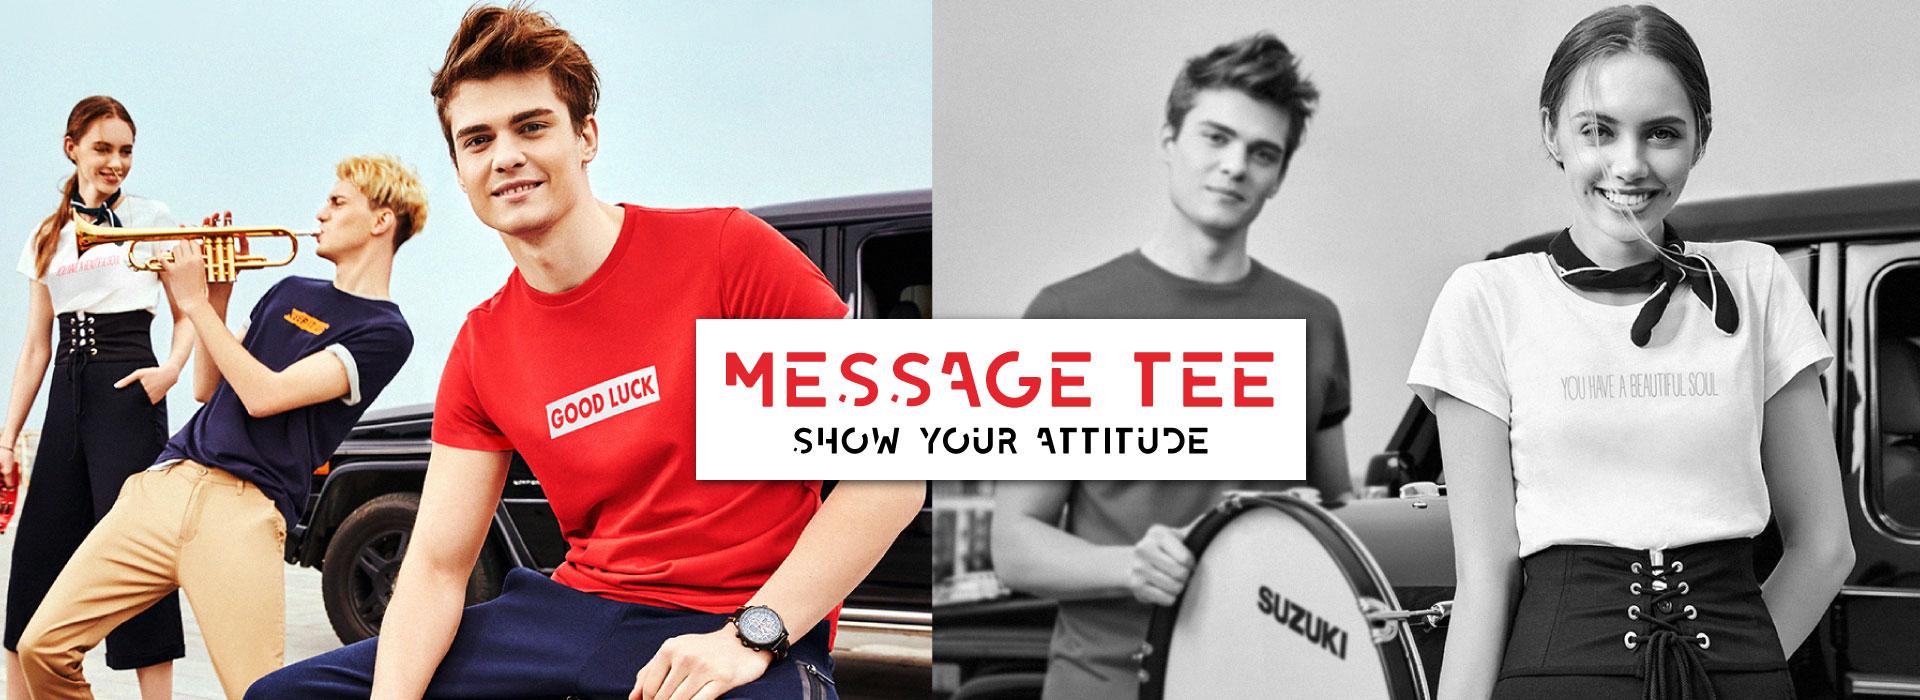 message tee